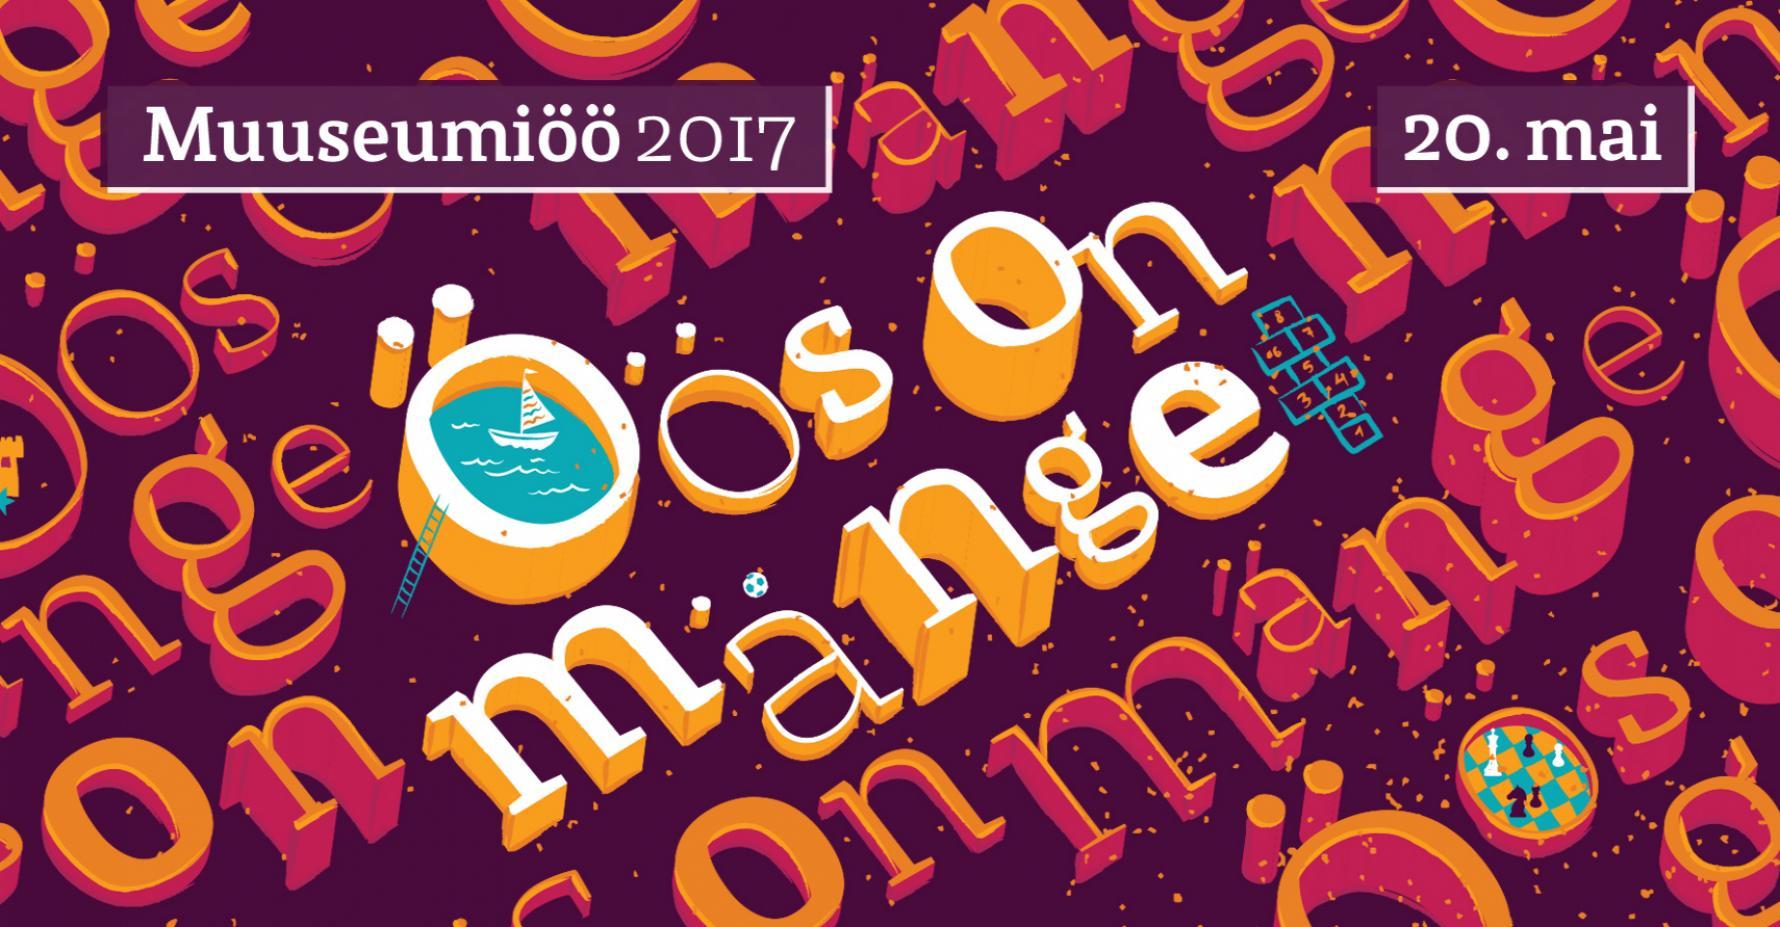 MUUSEUMIOO-2017-banner-horisontaalne_1